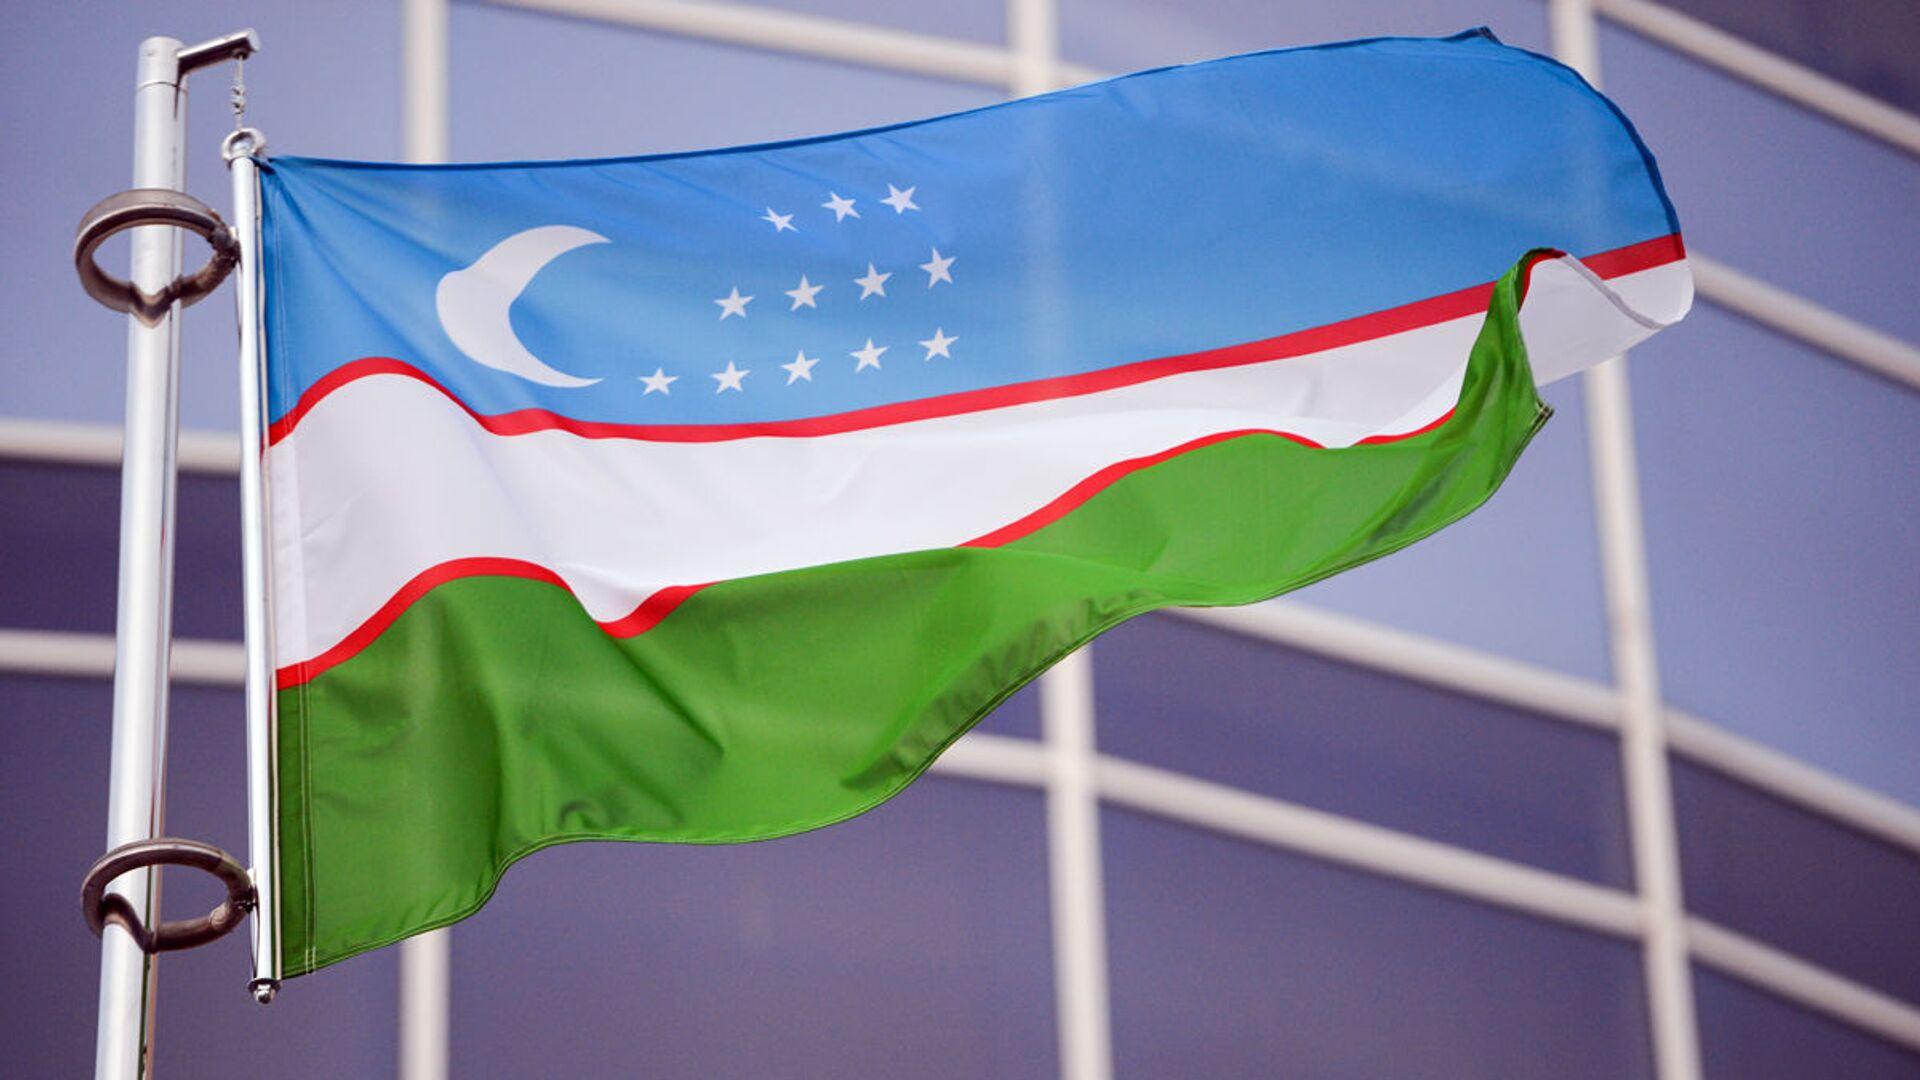 Flag Uzbekistana - Sputnik Oʻzbekiston, 1920, 02.09.2021